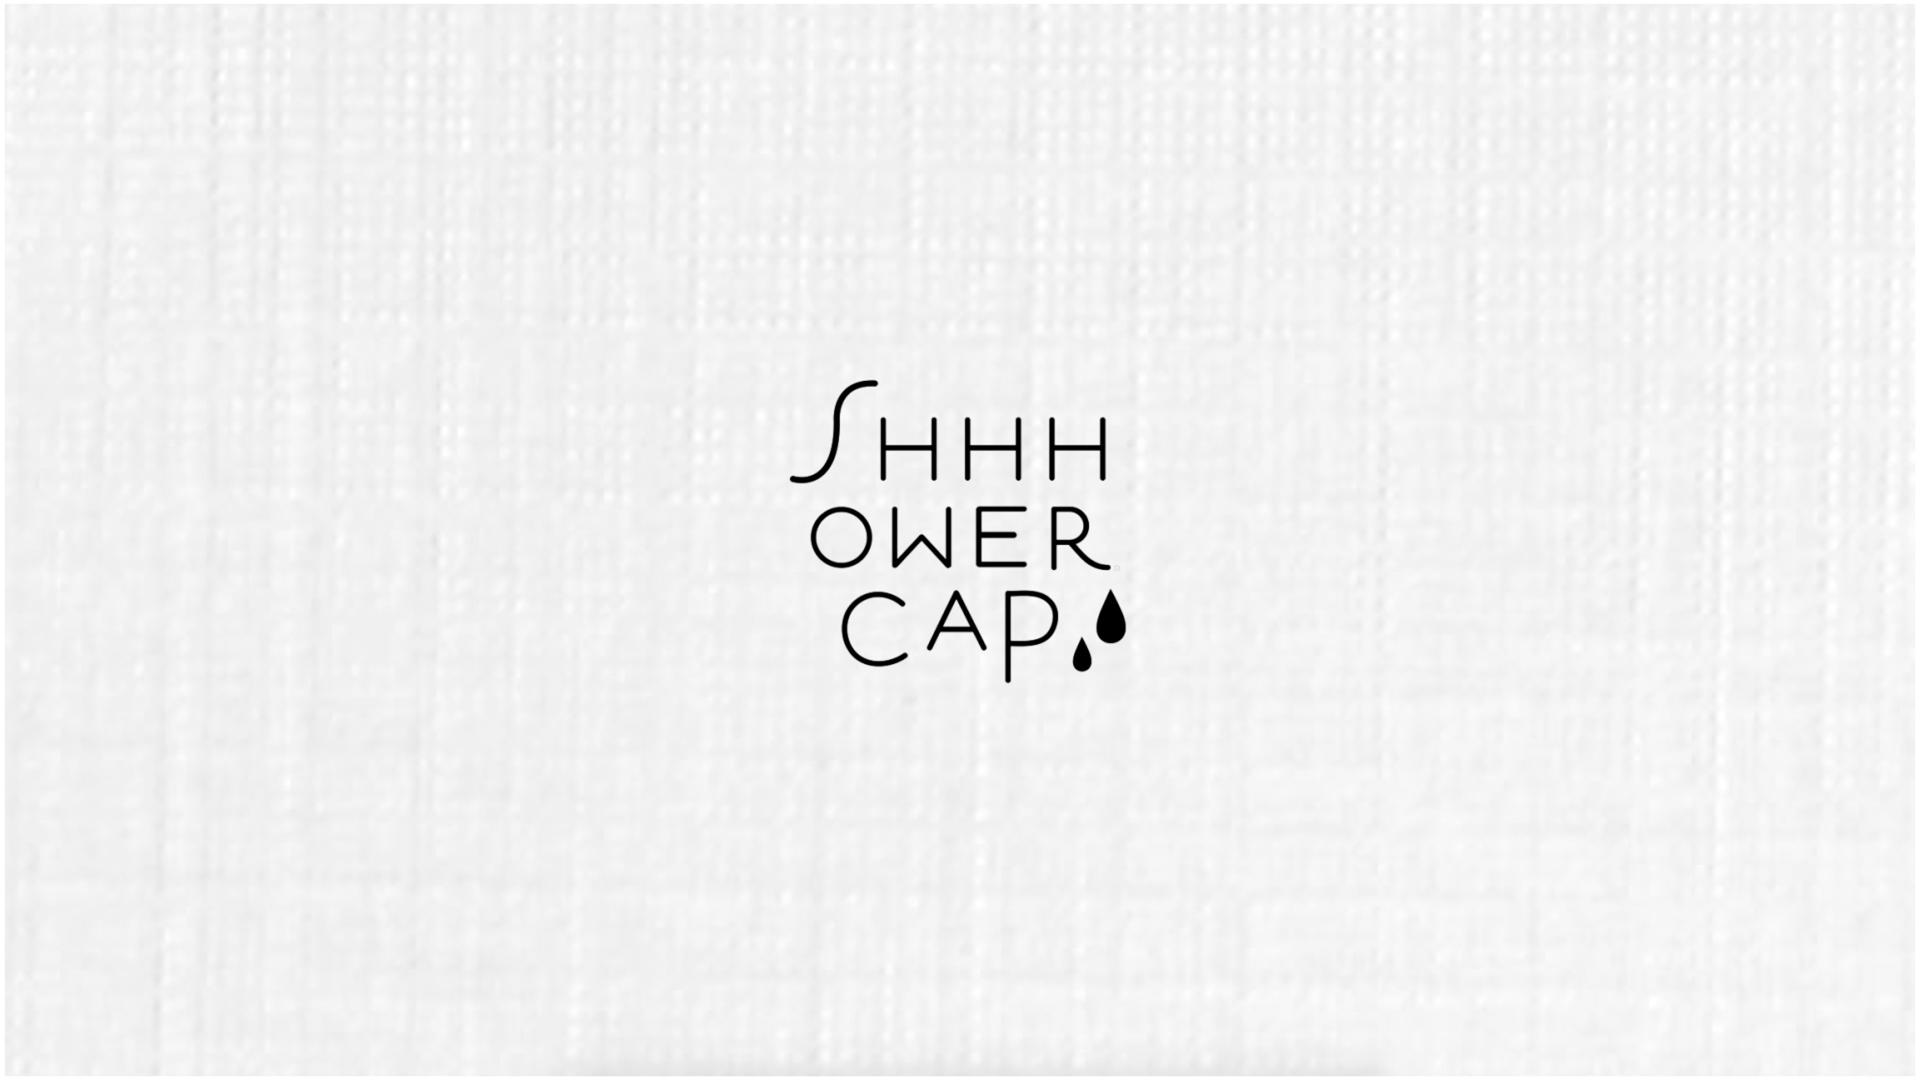 SHHHOWERCAP15.jpg